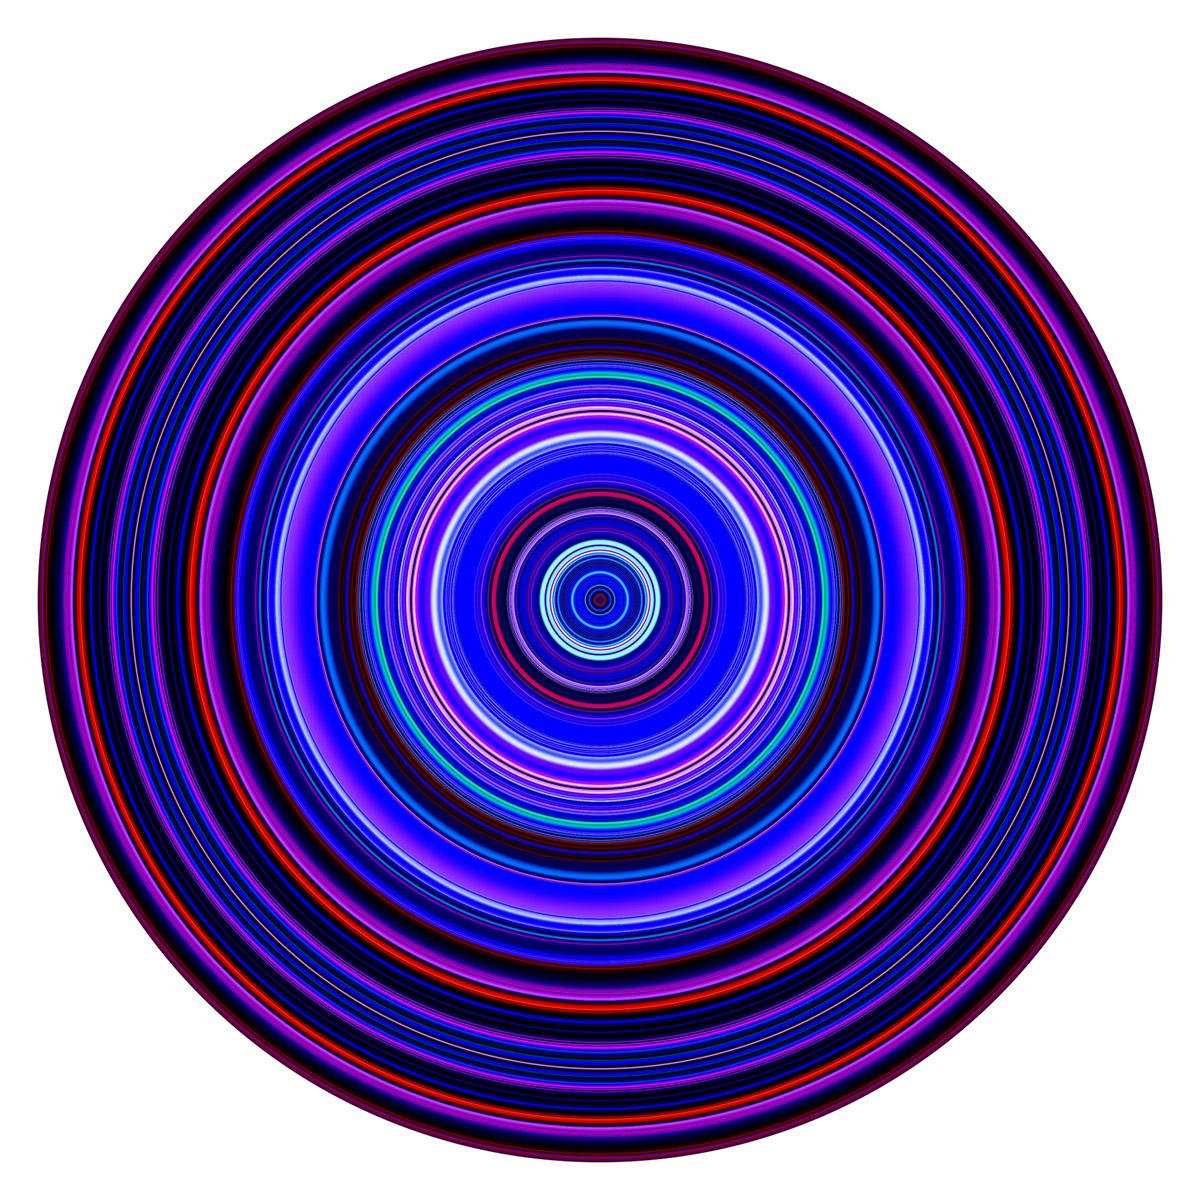 PAUL SNELL  Pulse # 201603  2016 Lambda print face-mounted to 6mm Plexiglas 118cm diameter